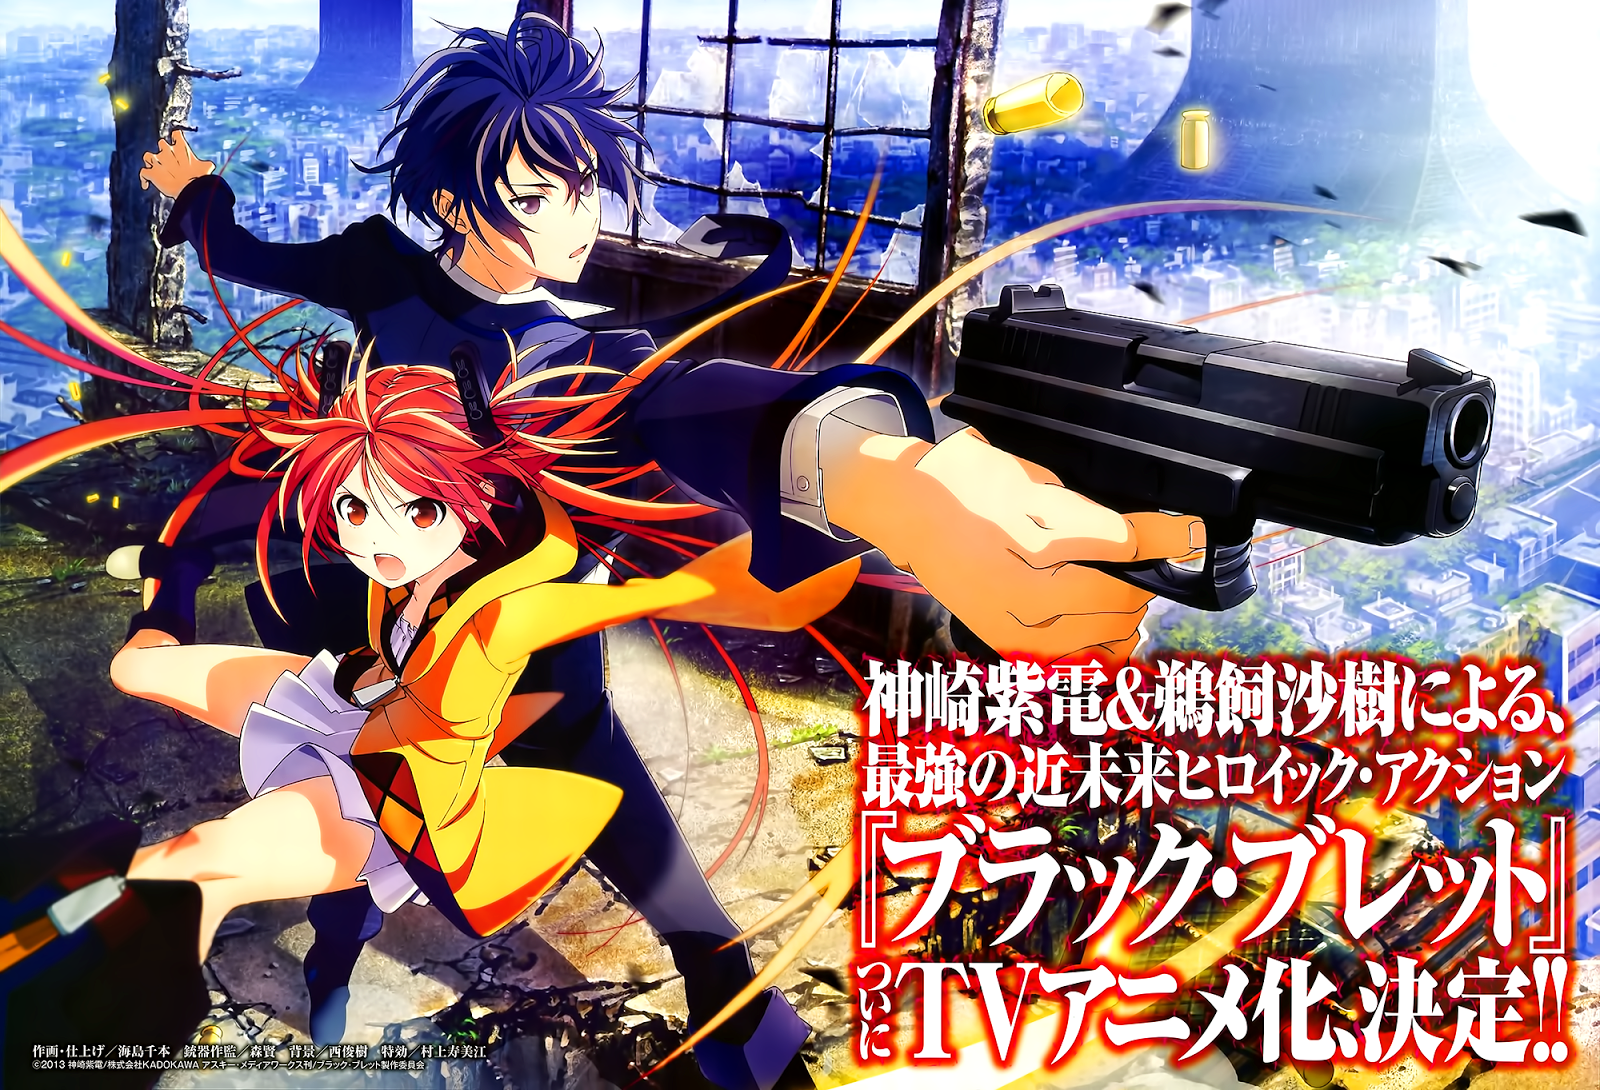 Download Anime Beberapa Series Keren Yang Wajib Kalian Tonton Ngombet